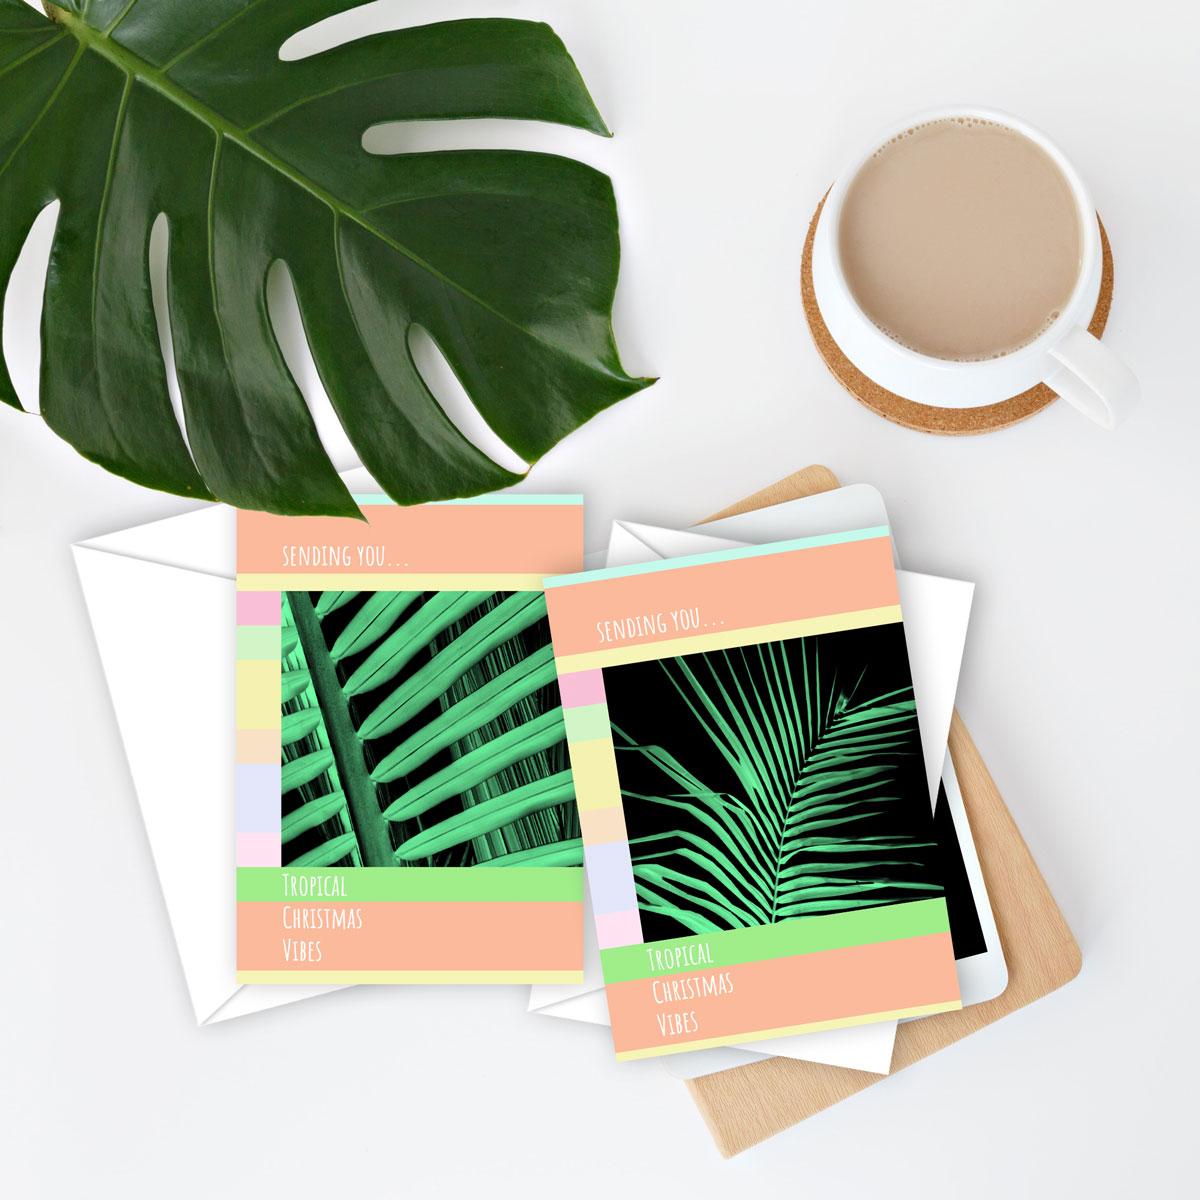 Sending You… Tropical Christmas Vibes – set of 10 cards